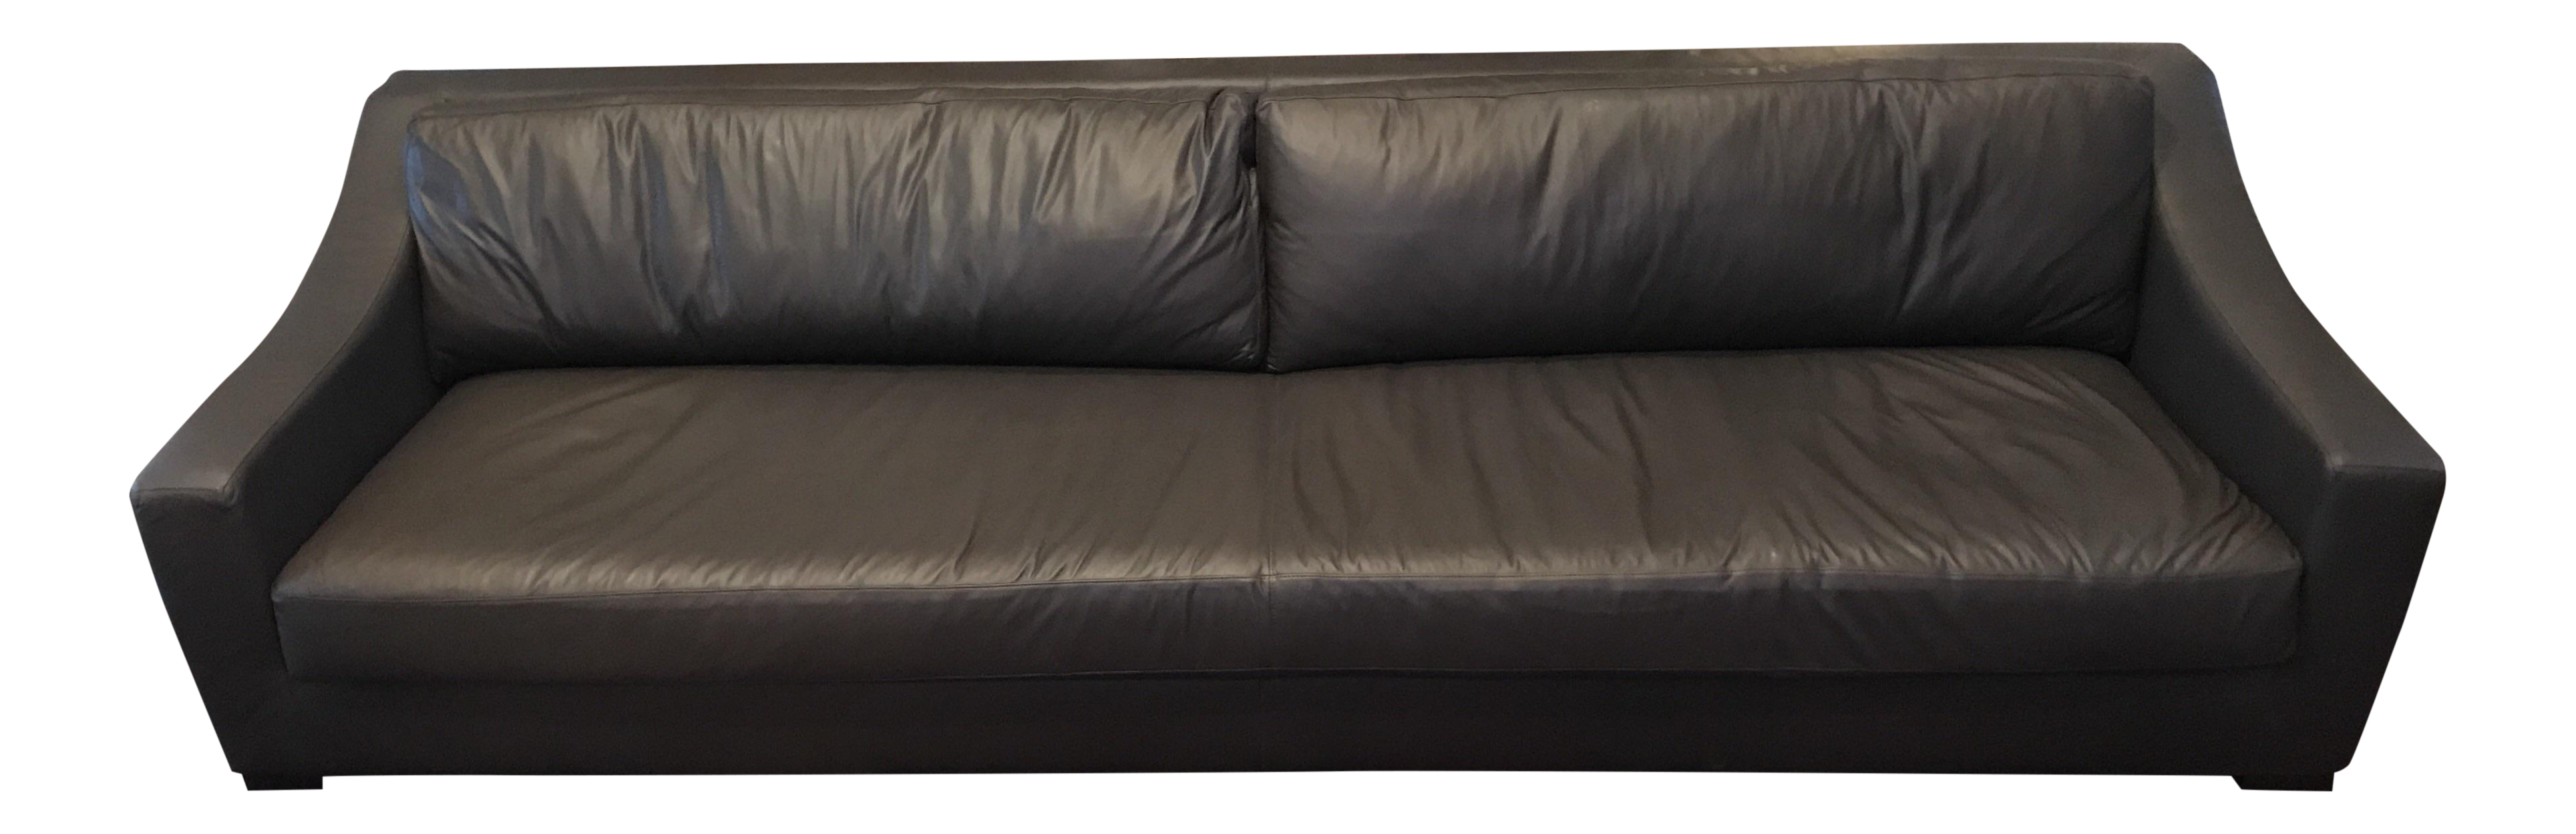 Restoration Hardware Leather Sofa Chairish